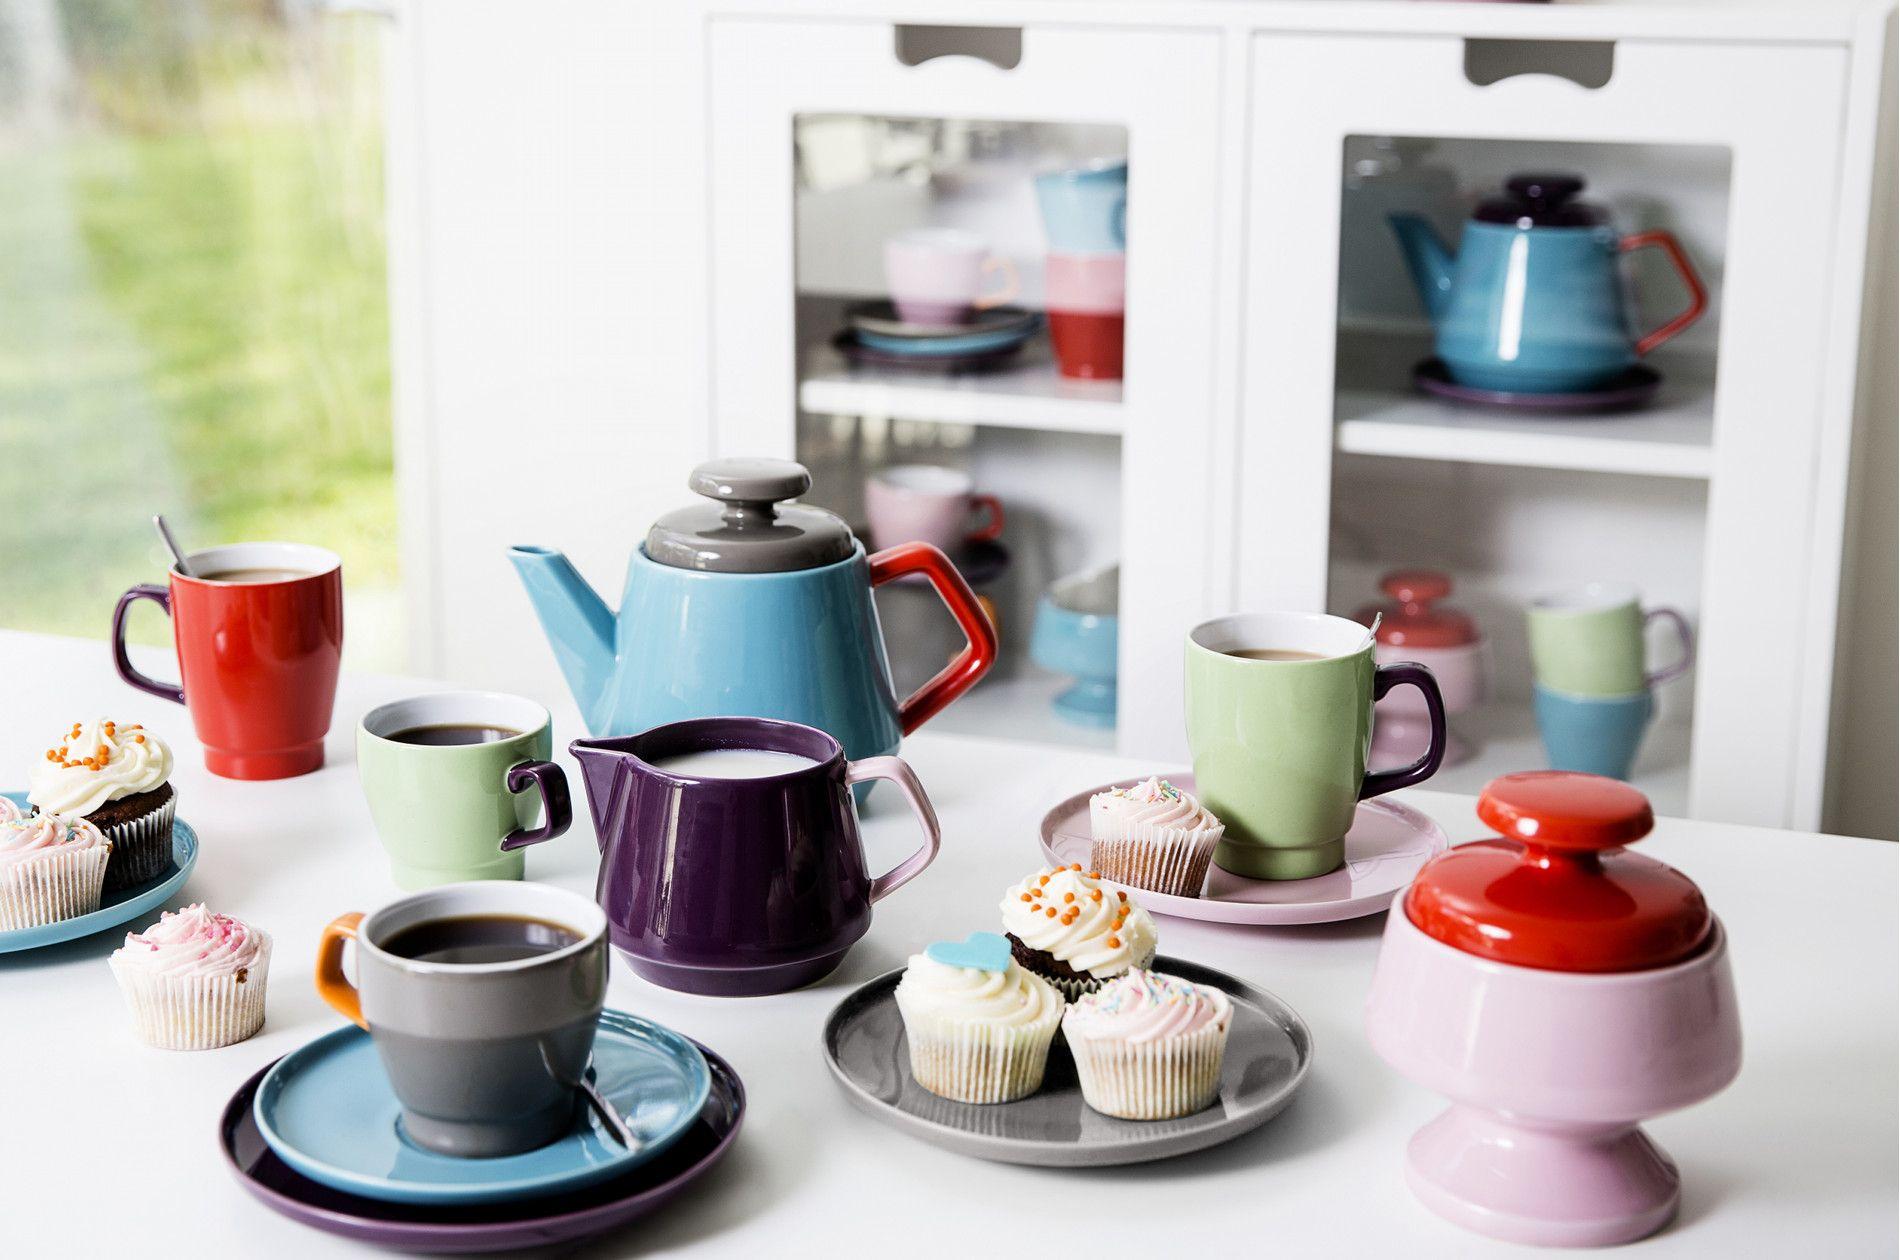 Skandinavisches Porzellan pin cookionista auf interieur porzellan geschirr